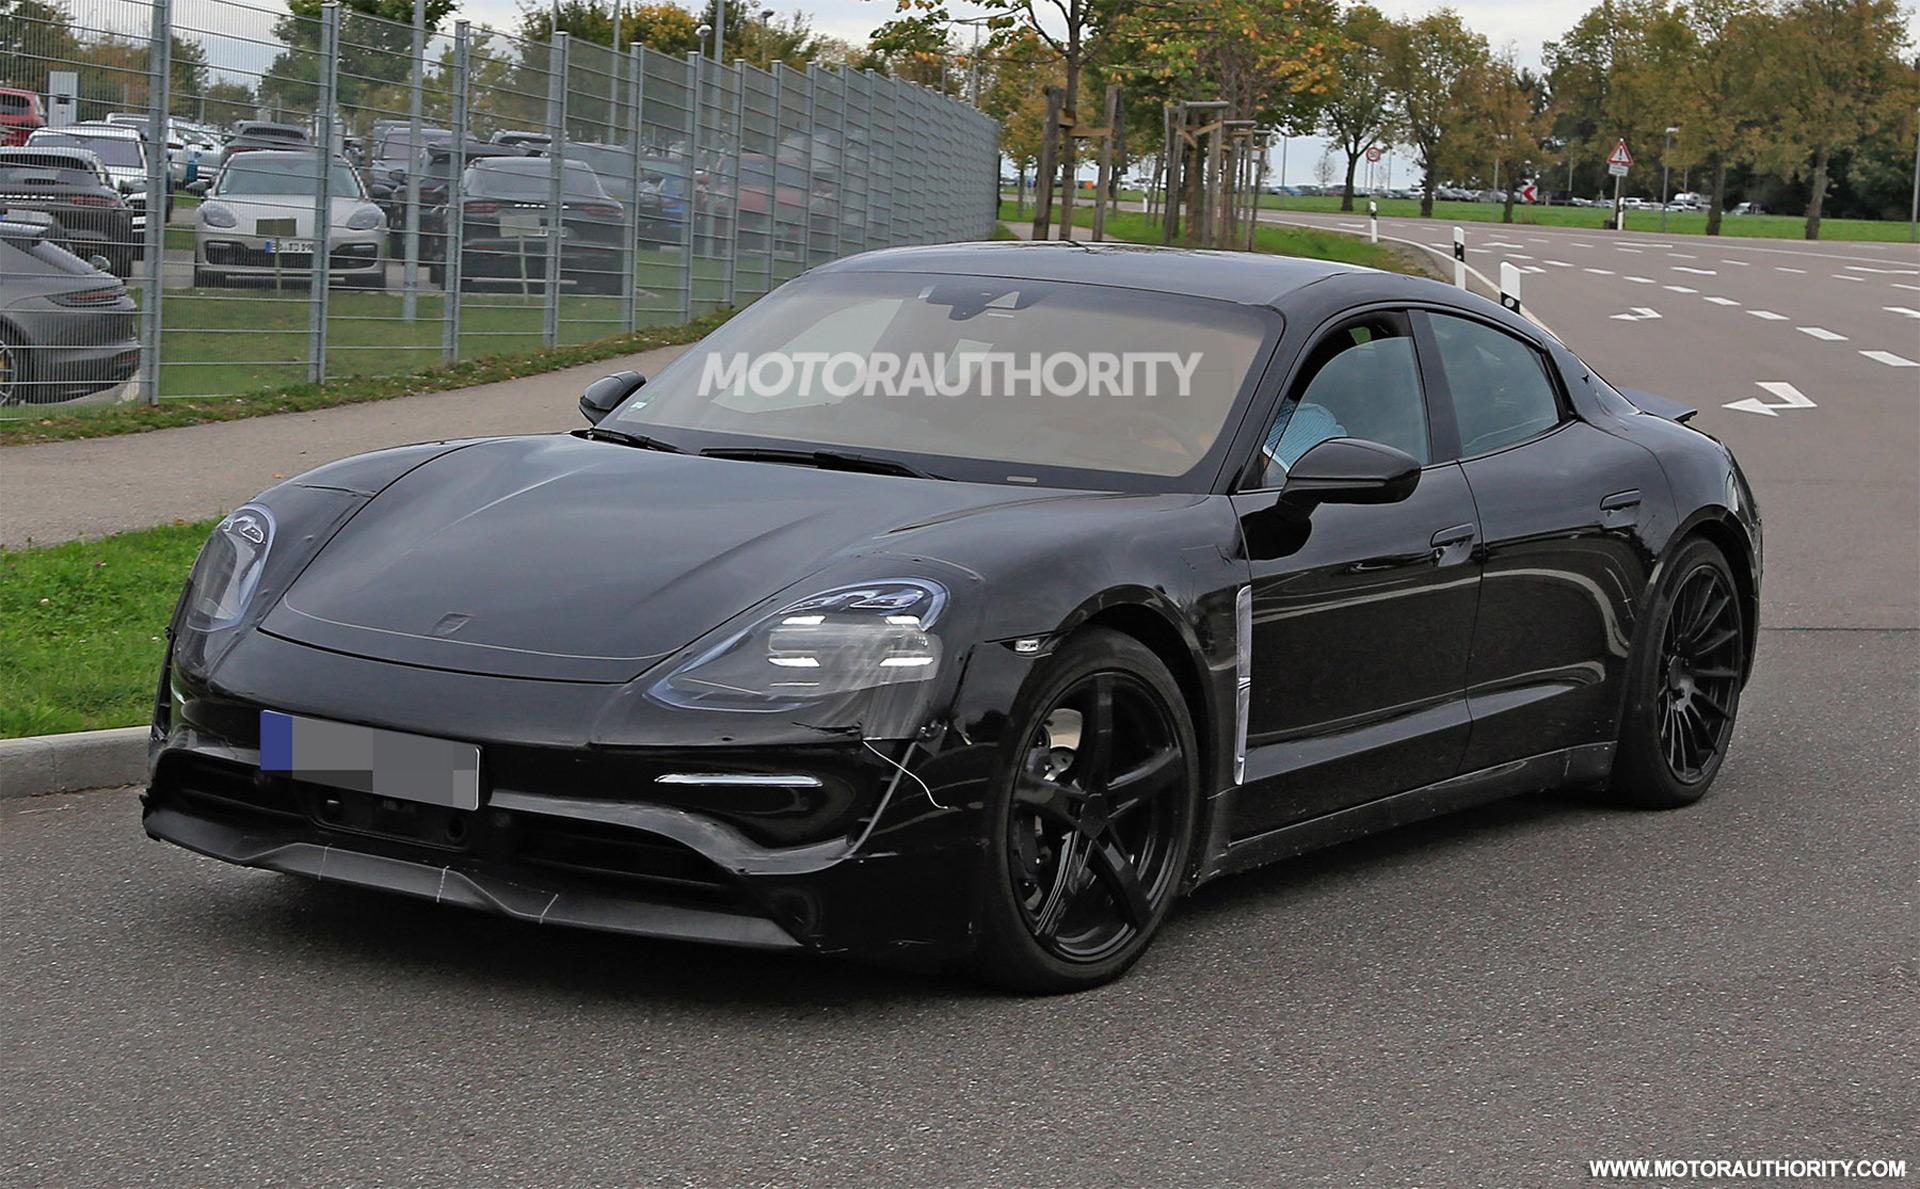 2020 Porsche Mission E Electric Sedan Spy Shots